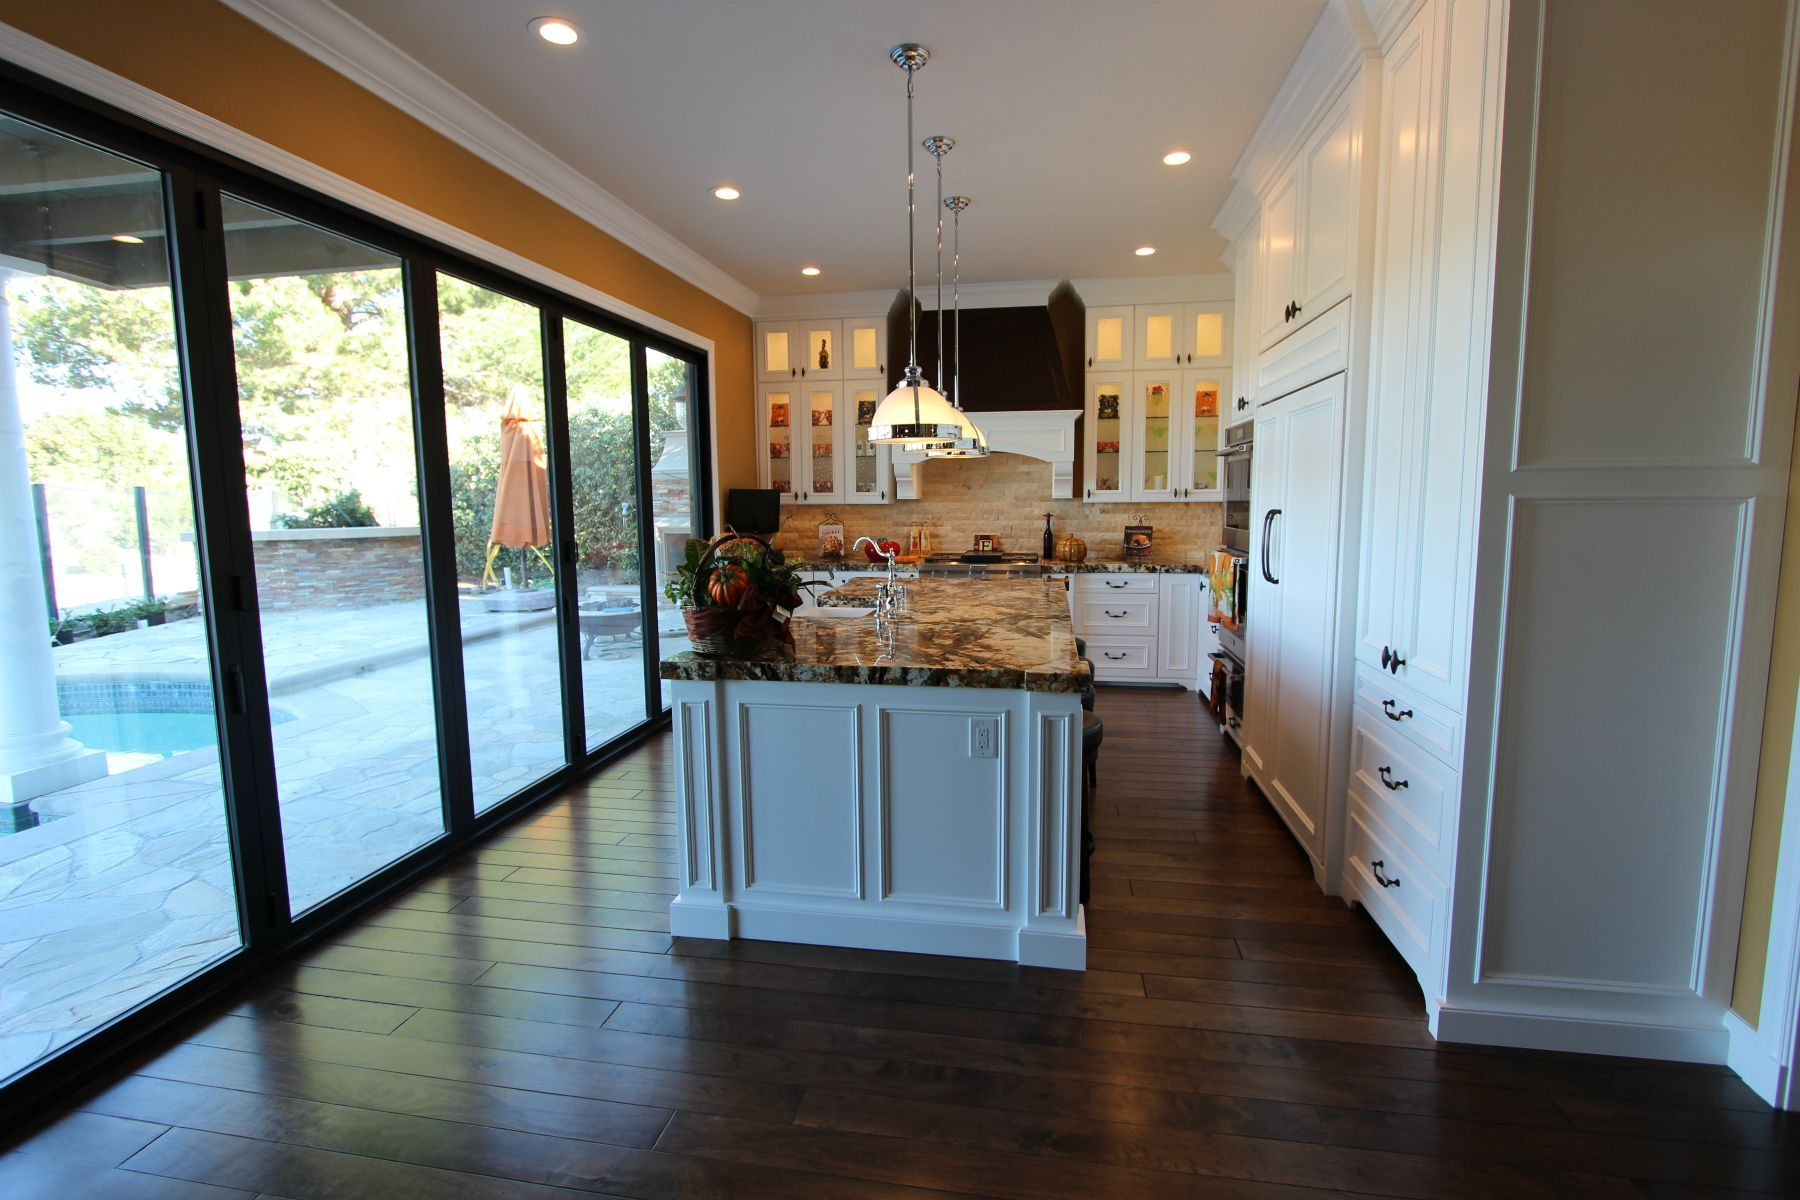 Design Build Custom Kitchen Remodel in Coto De Caza Orange County ...